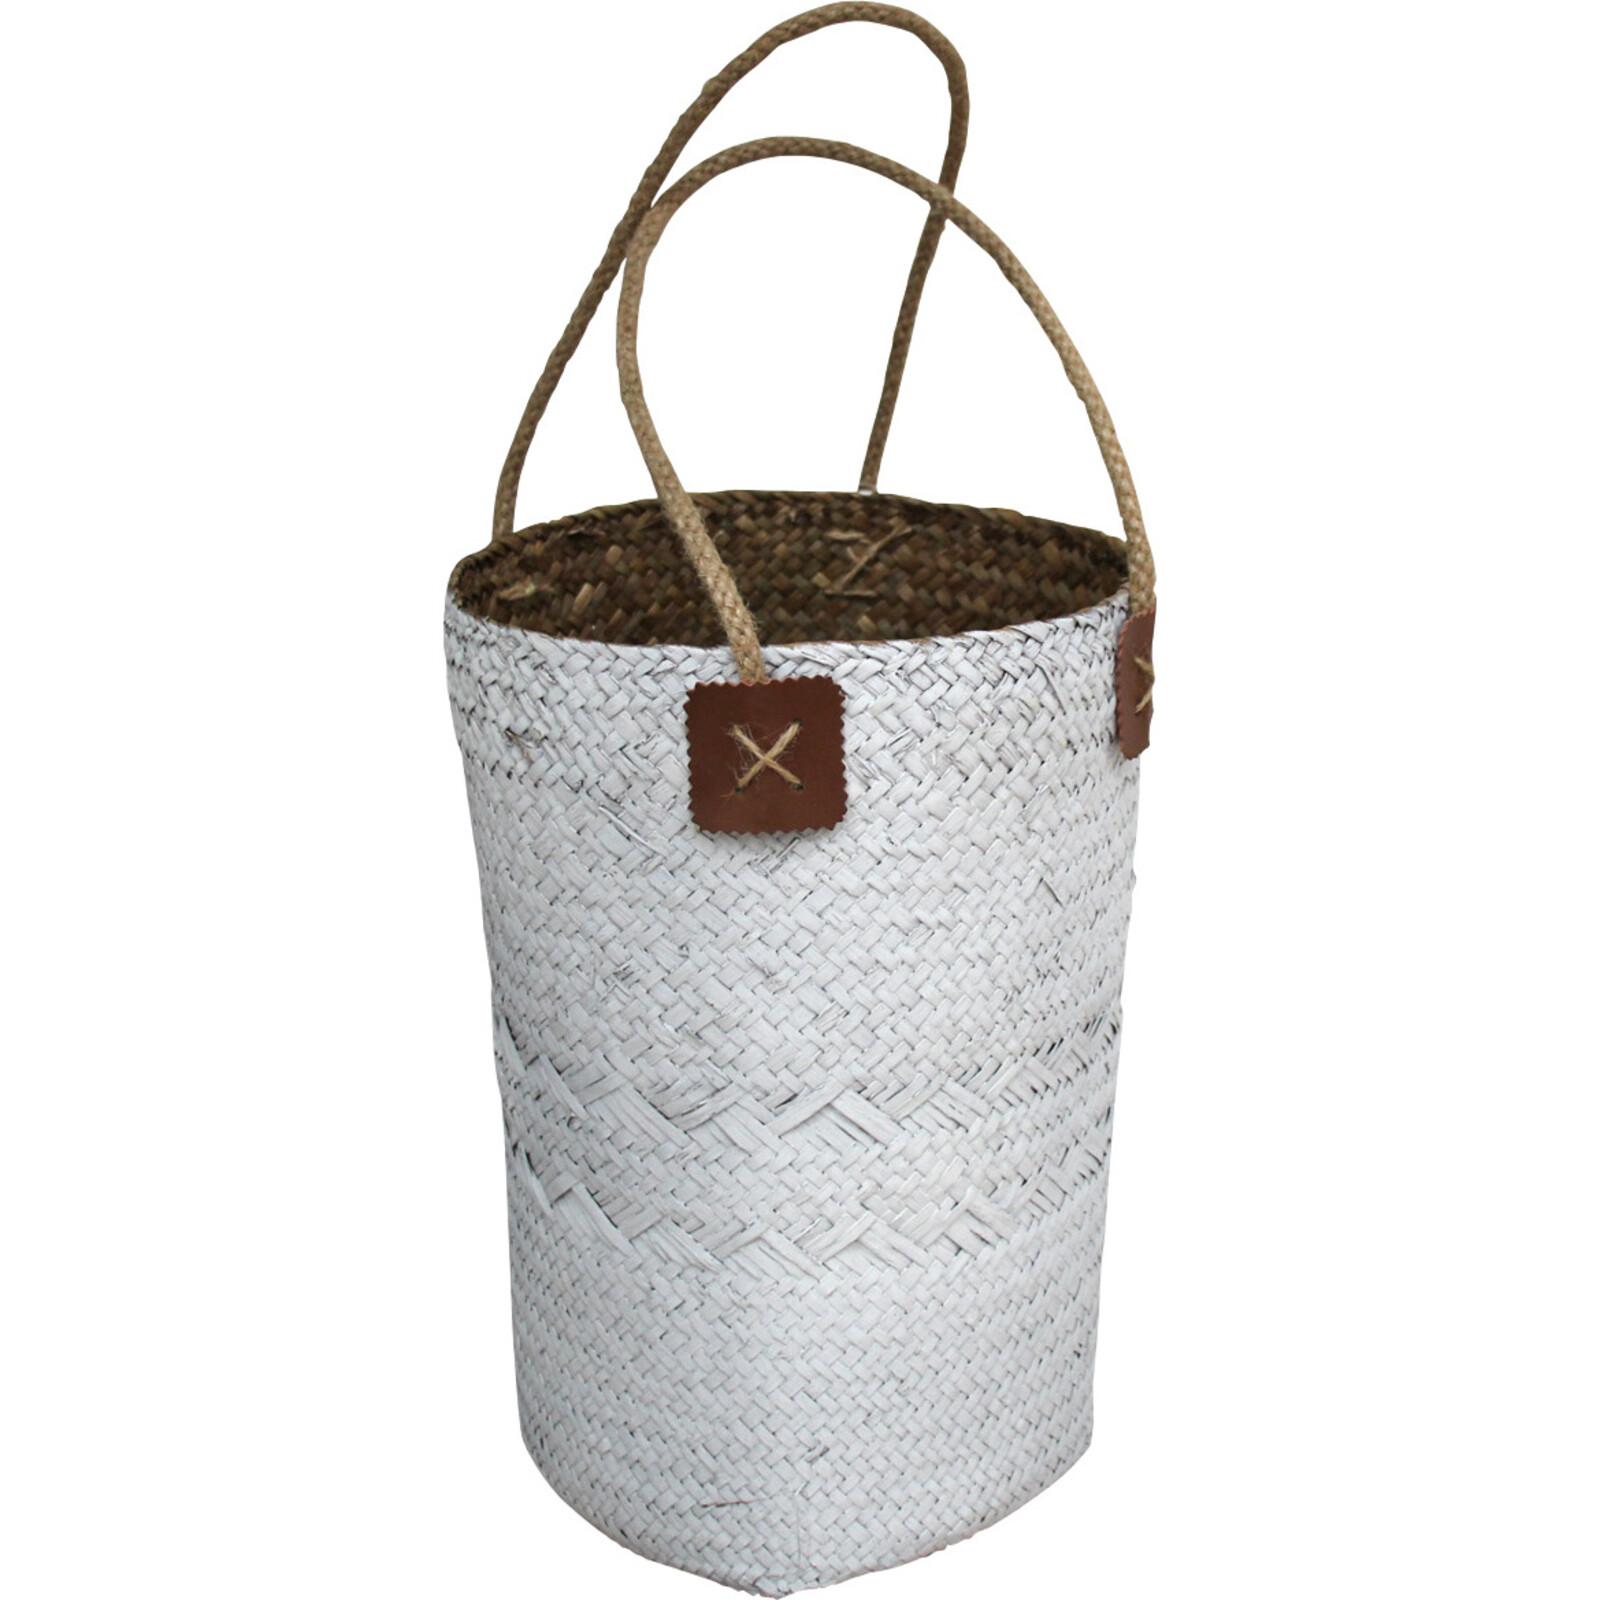 Woven Planter/ Carry White